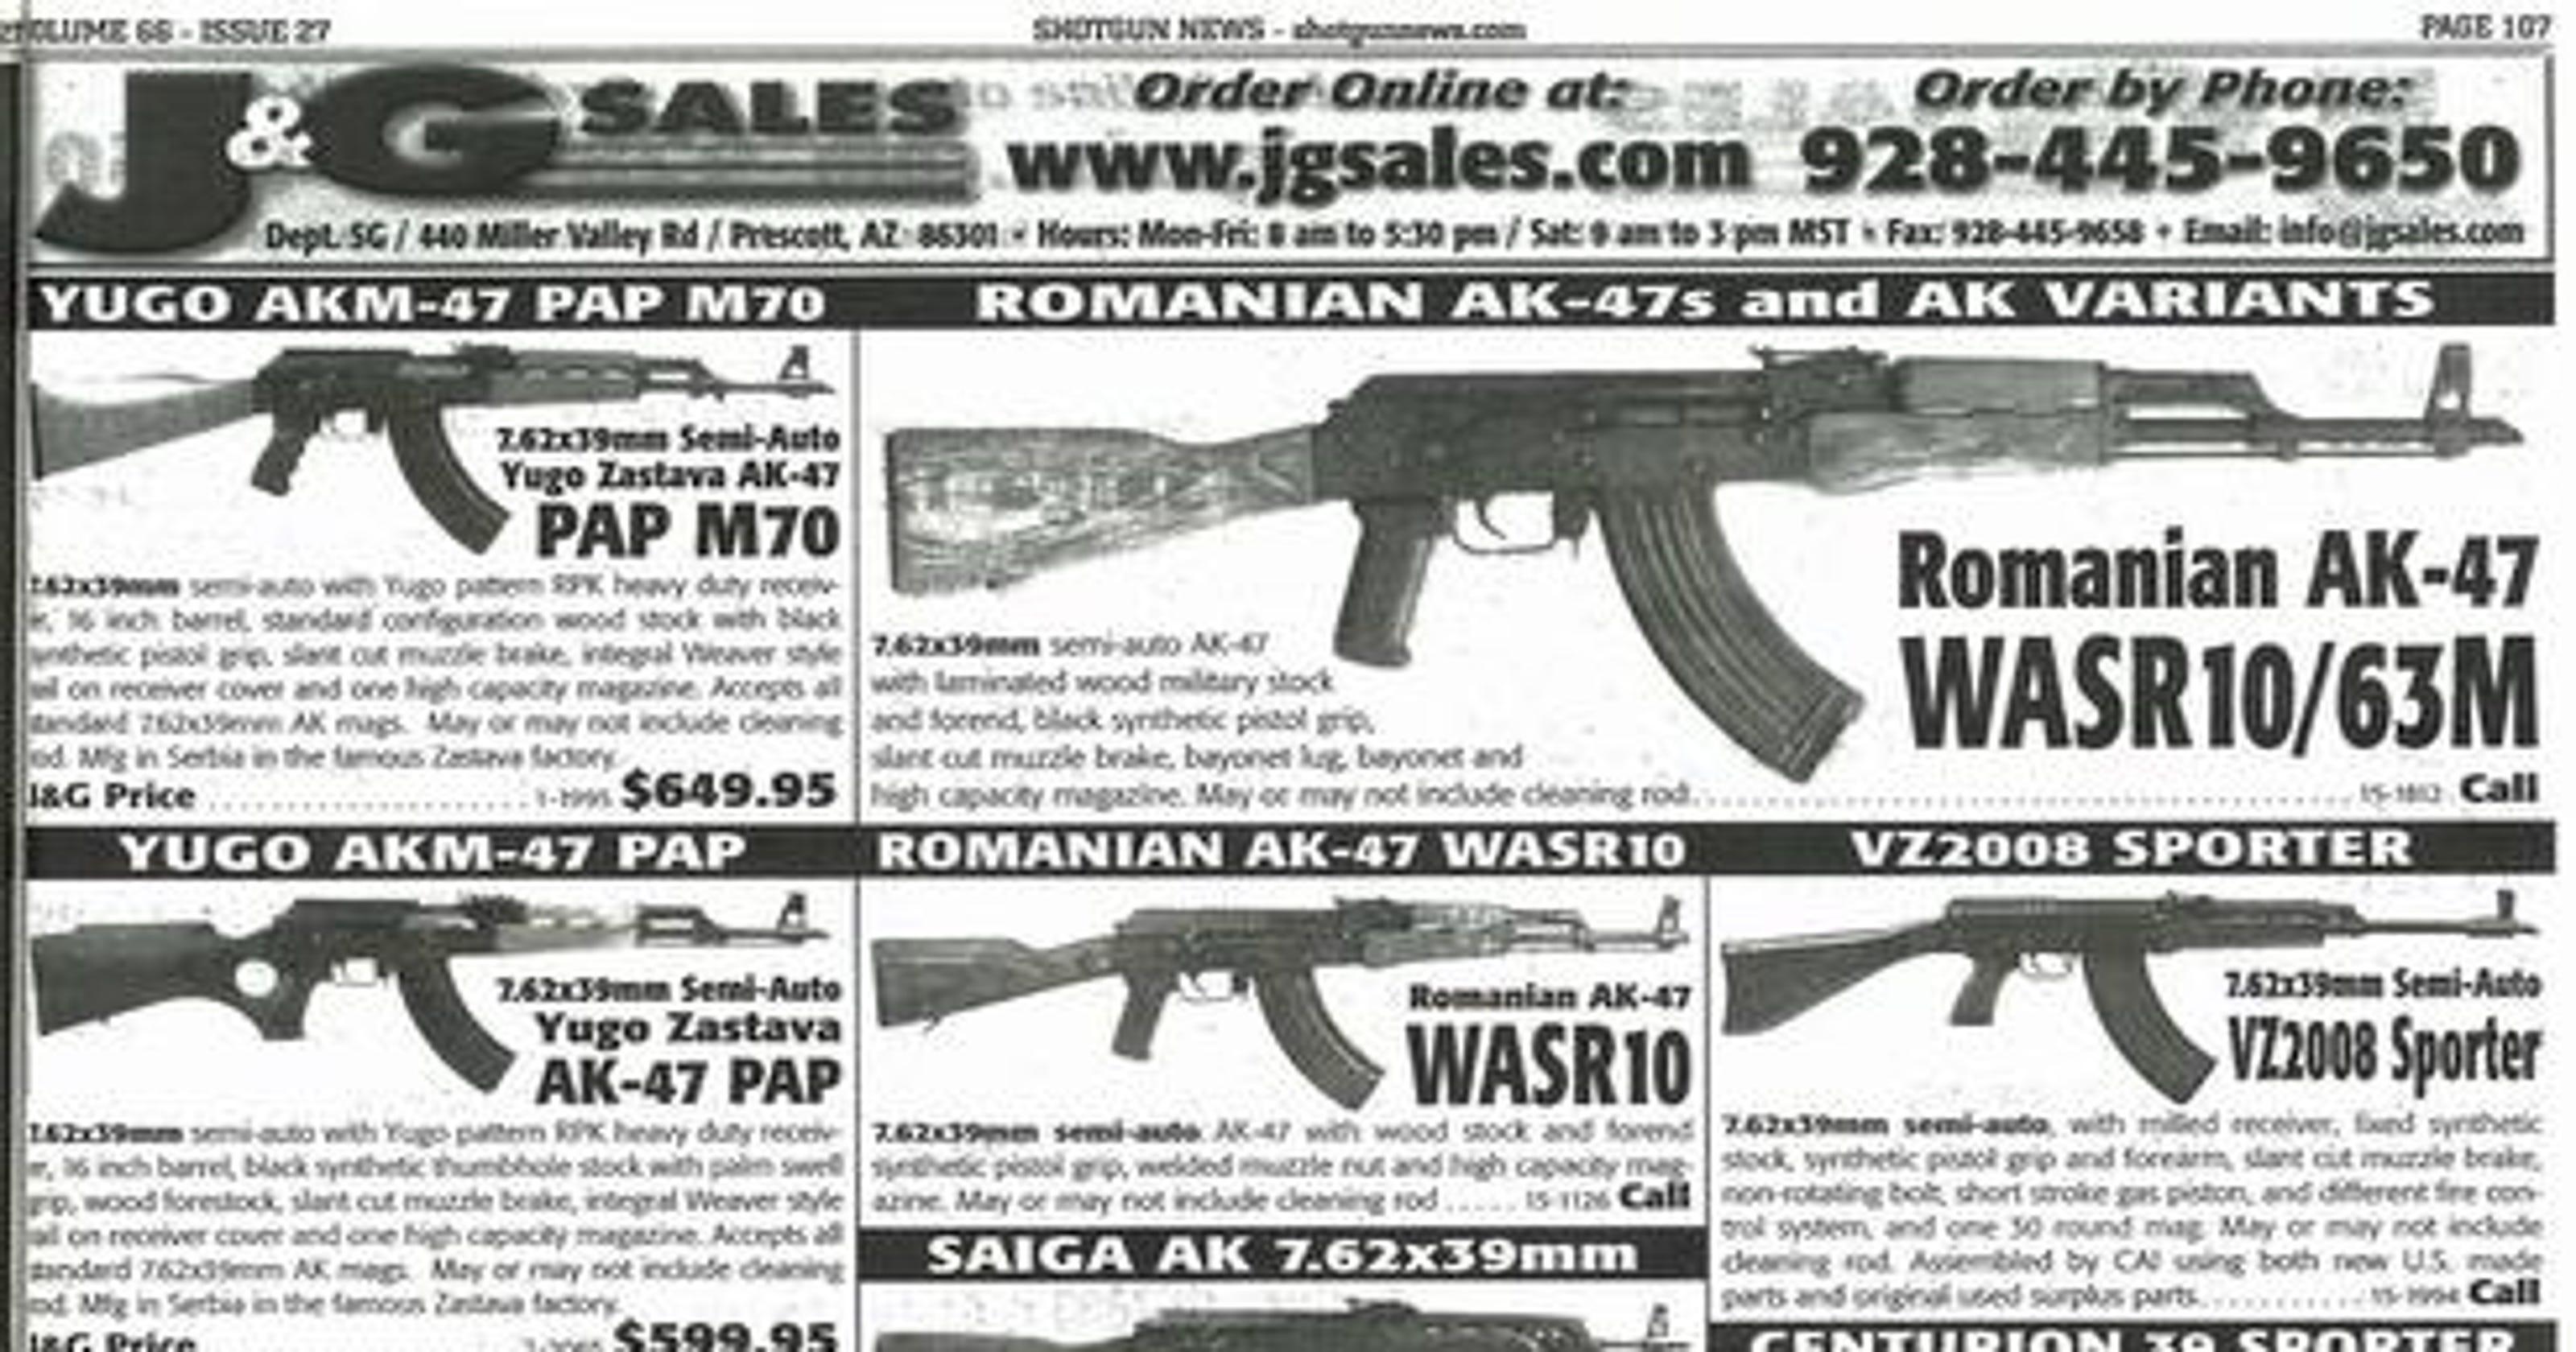 Romanian WASR10 AK47 military variation rifle w military style